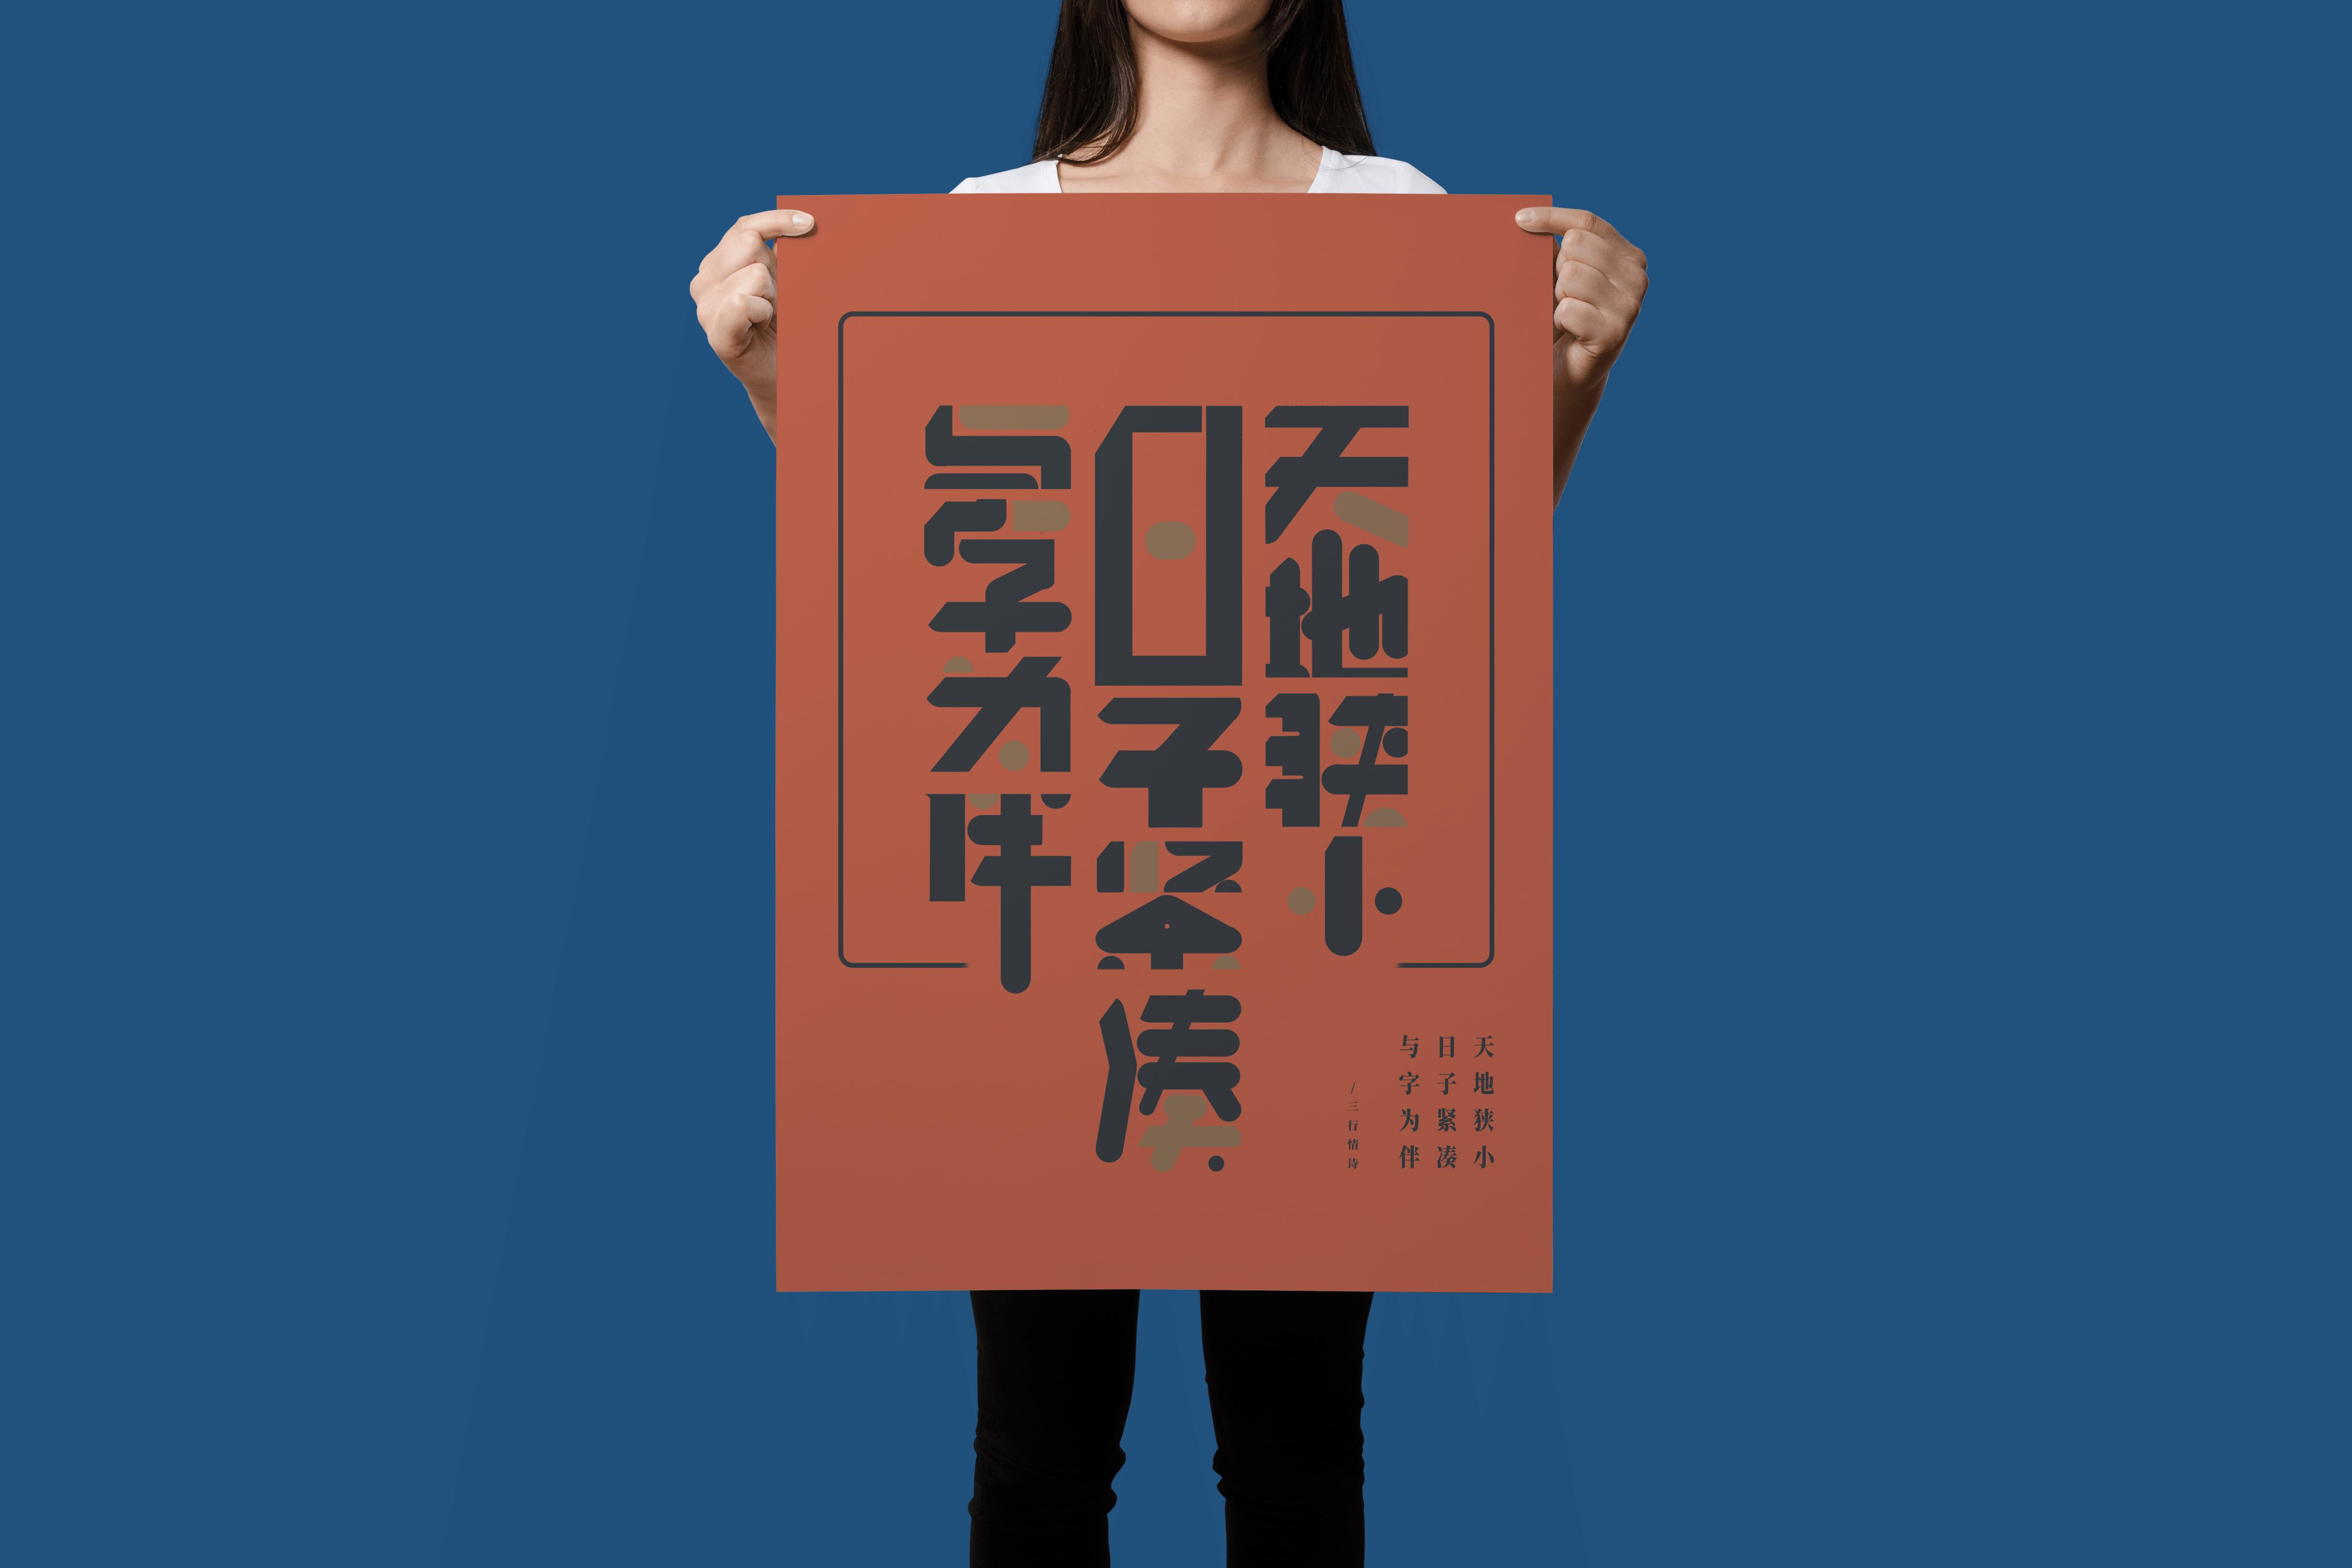 Graphic font poster design